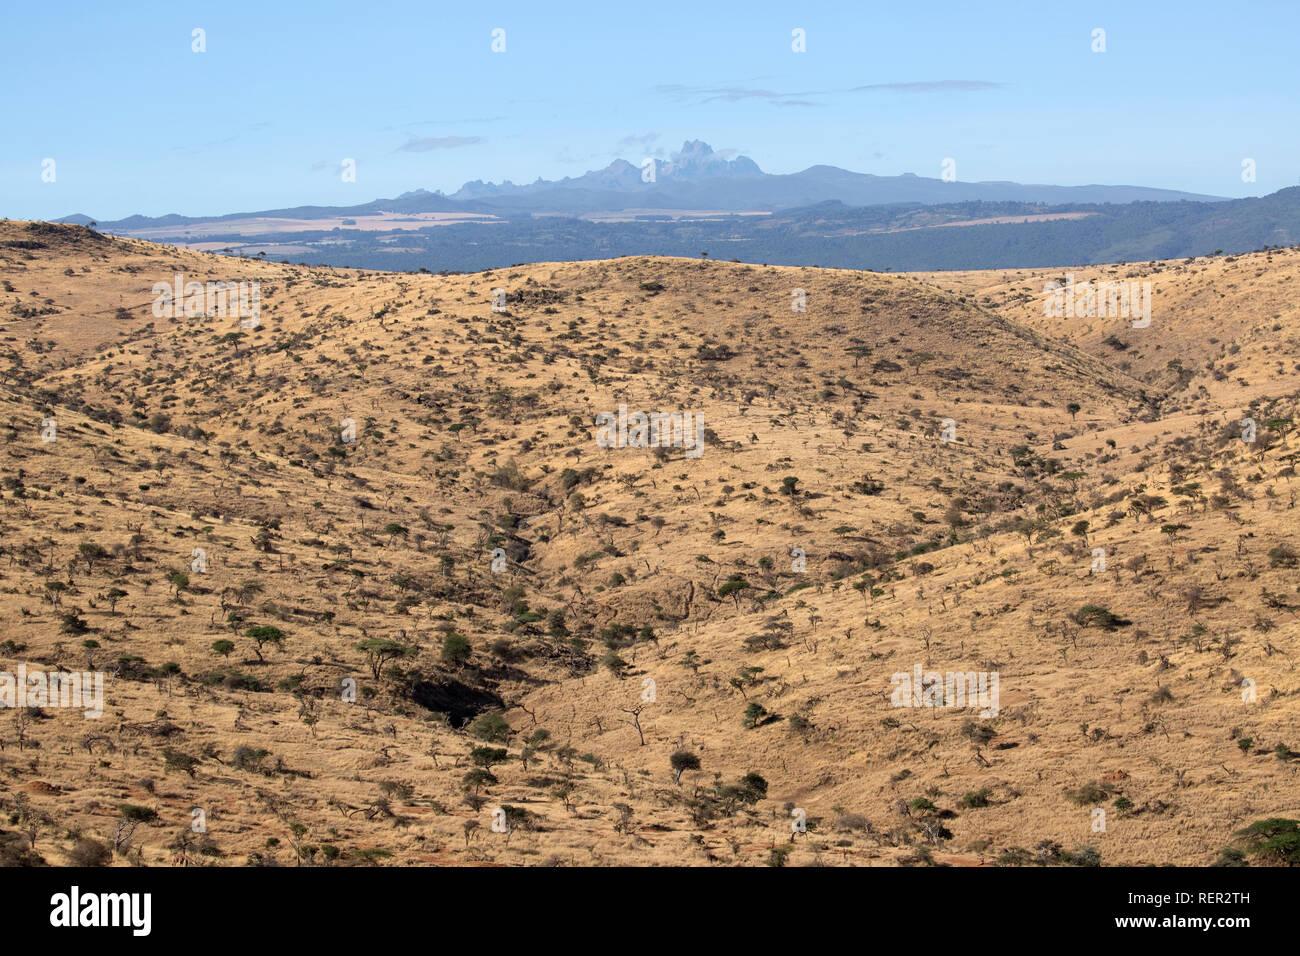 Semi arid scrub with Mount Kenya from Lewa Wildlife Conservancy Kenya - Stock Image